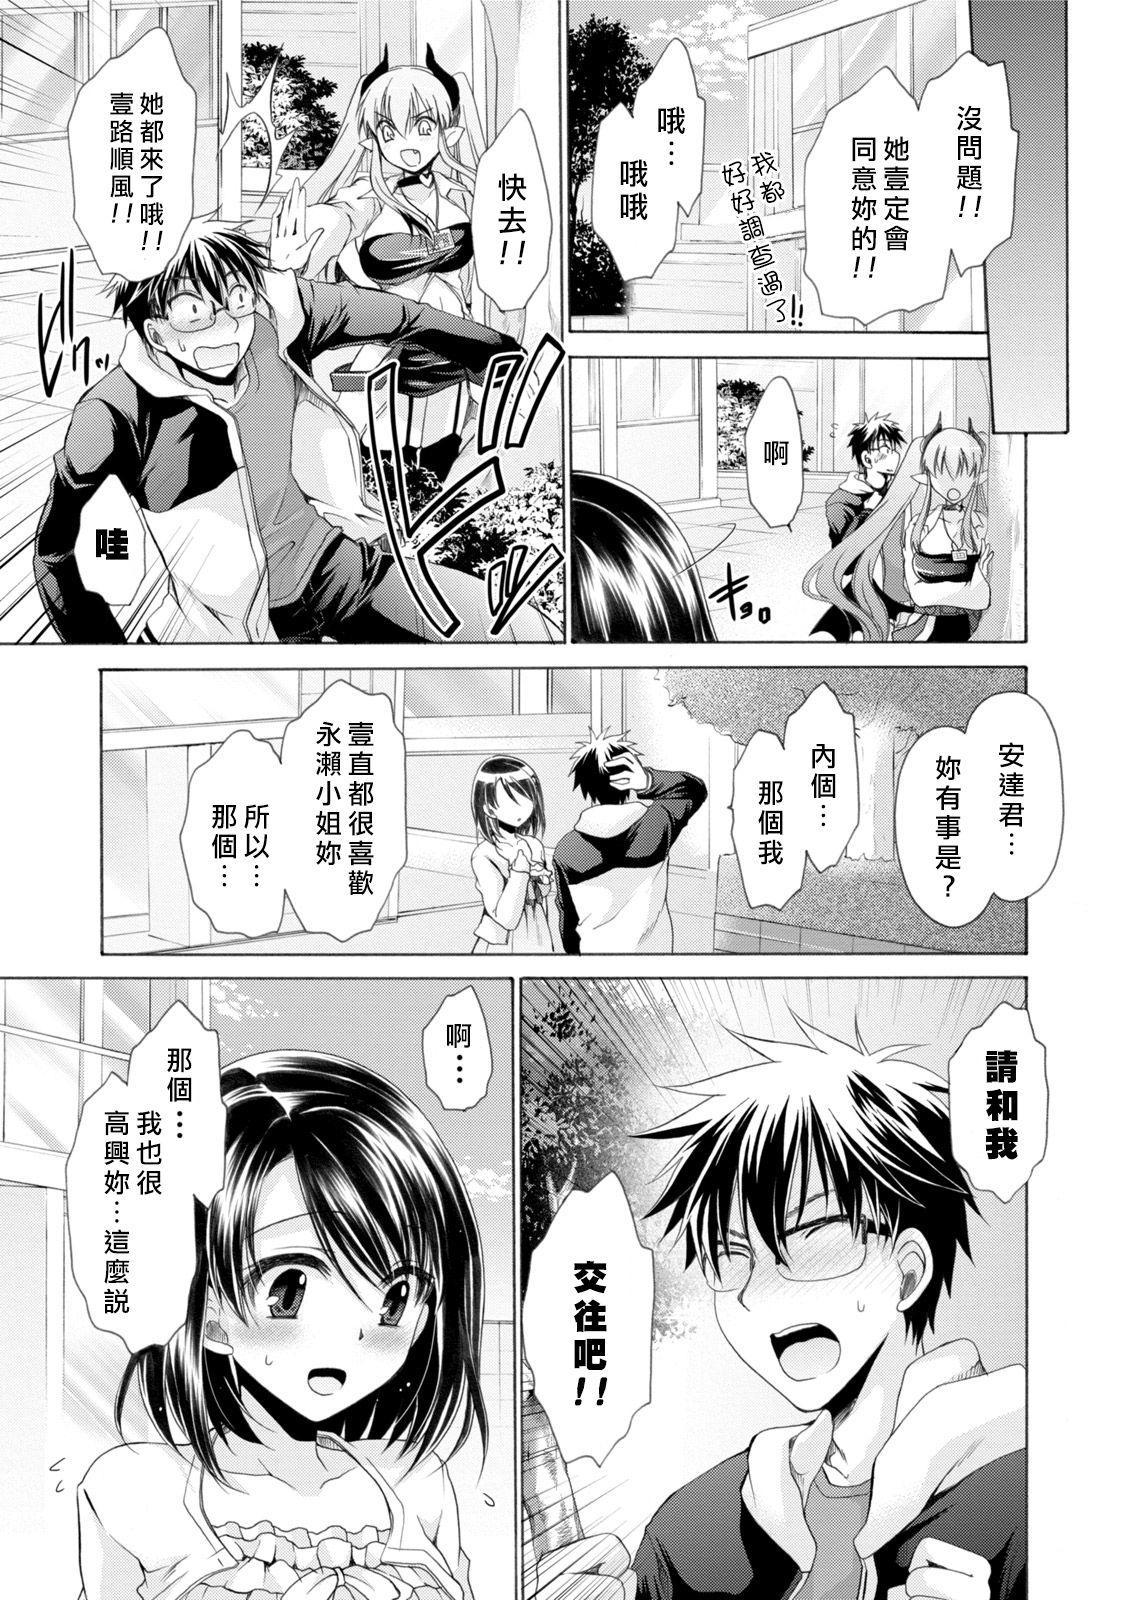 [Shinonome Ryu] Ore to Kanojo to Owaru Sekai - World's end LoveStory ch.1-9 [Chinese] [爱弹幕汉化组] [Digital] 24